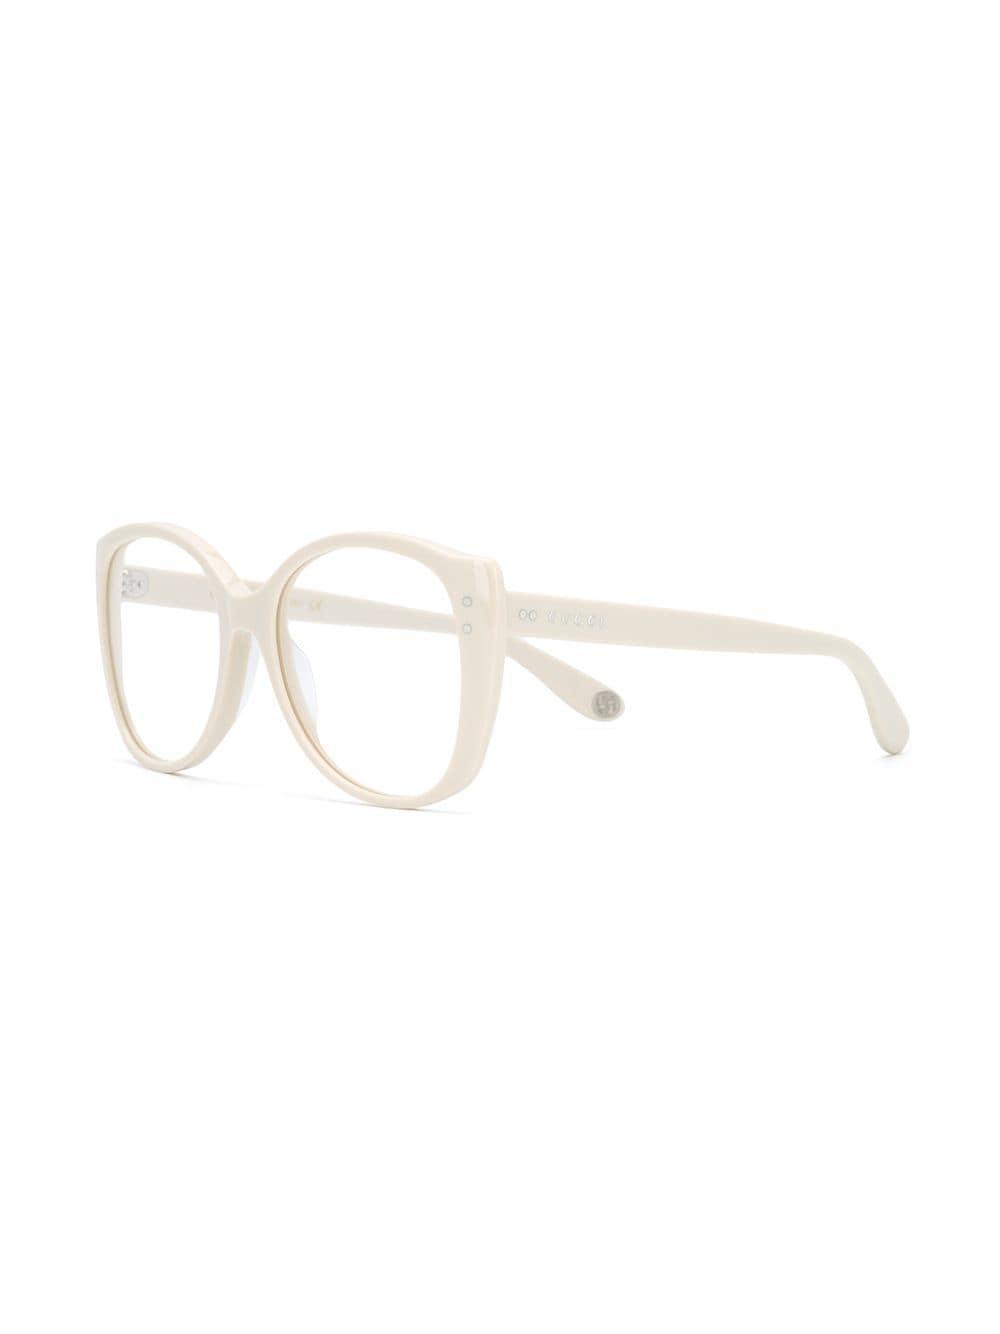 92759cc3466 Gucci Oversized Cat-eye Frame Glasses in White - Lyst